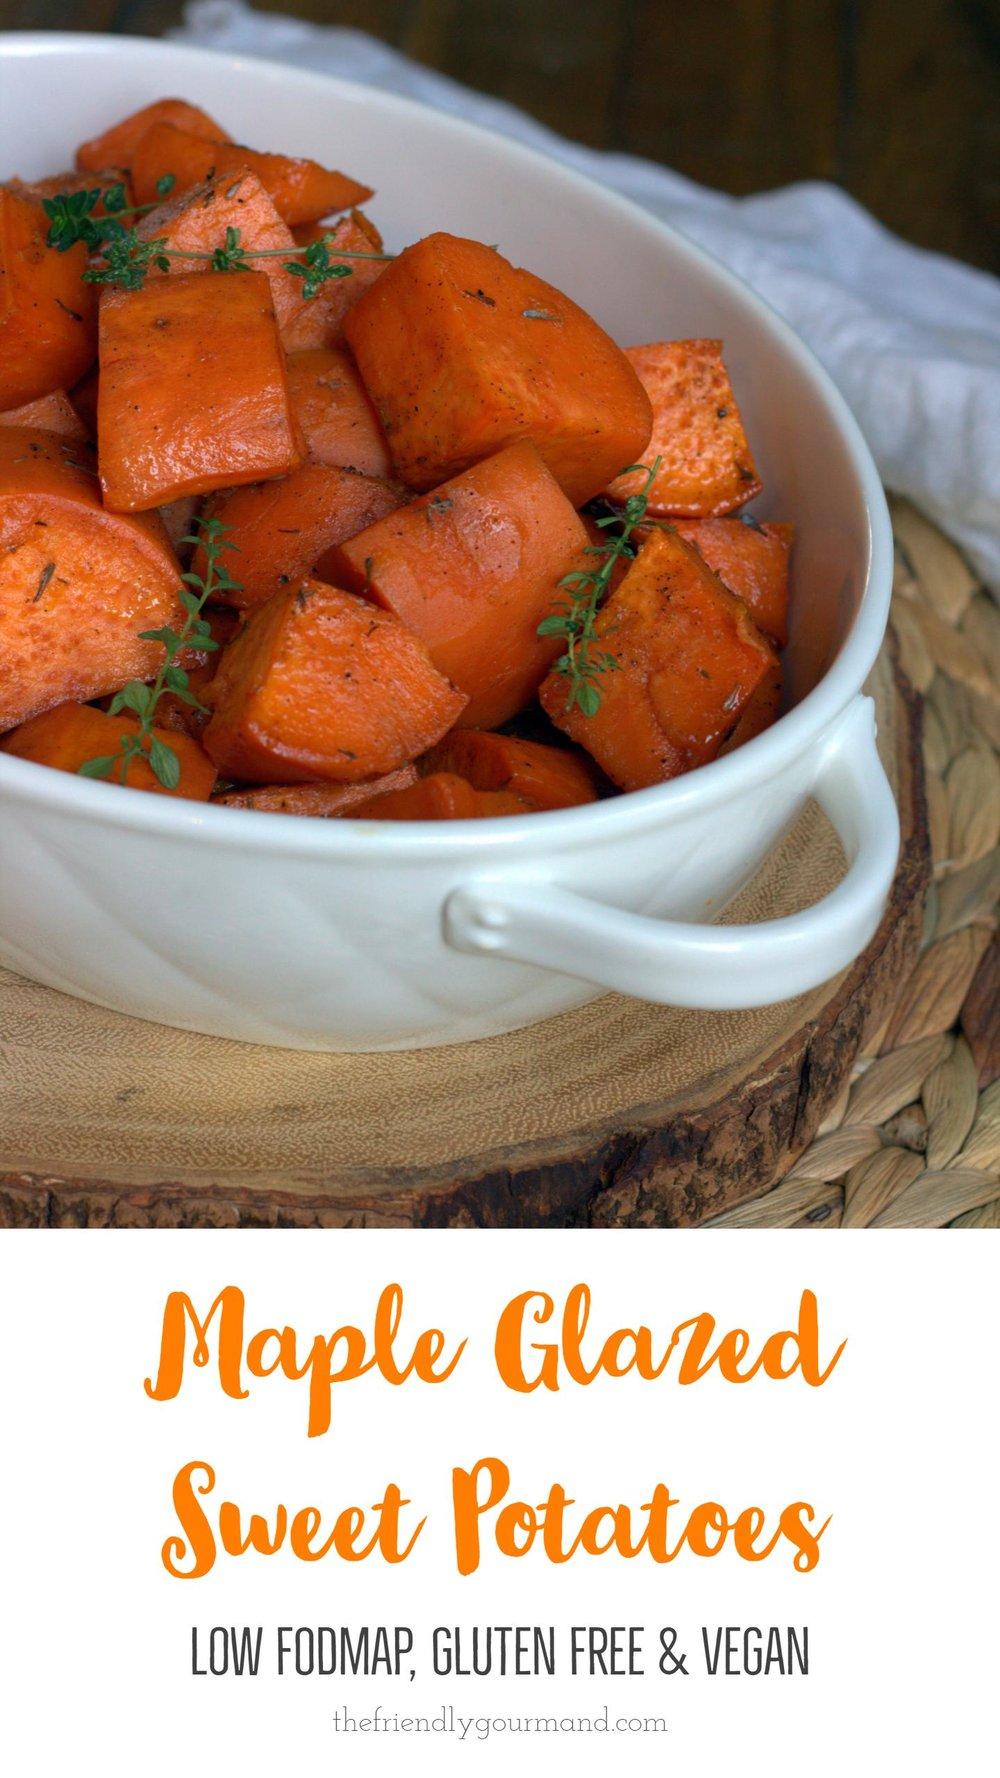 Maple Glazed Sweet Potatoes - Low FODMAP, Gluten Free and Vegan | The Friendly Gourmand | #lowfodmap #glutenfree #vegan #thanksgiving #christmas